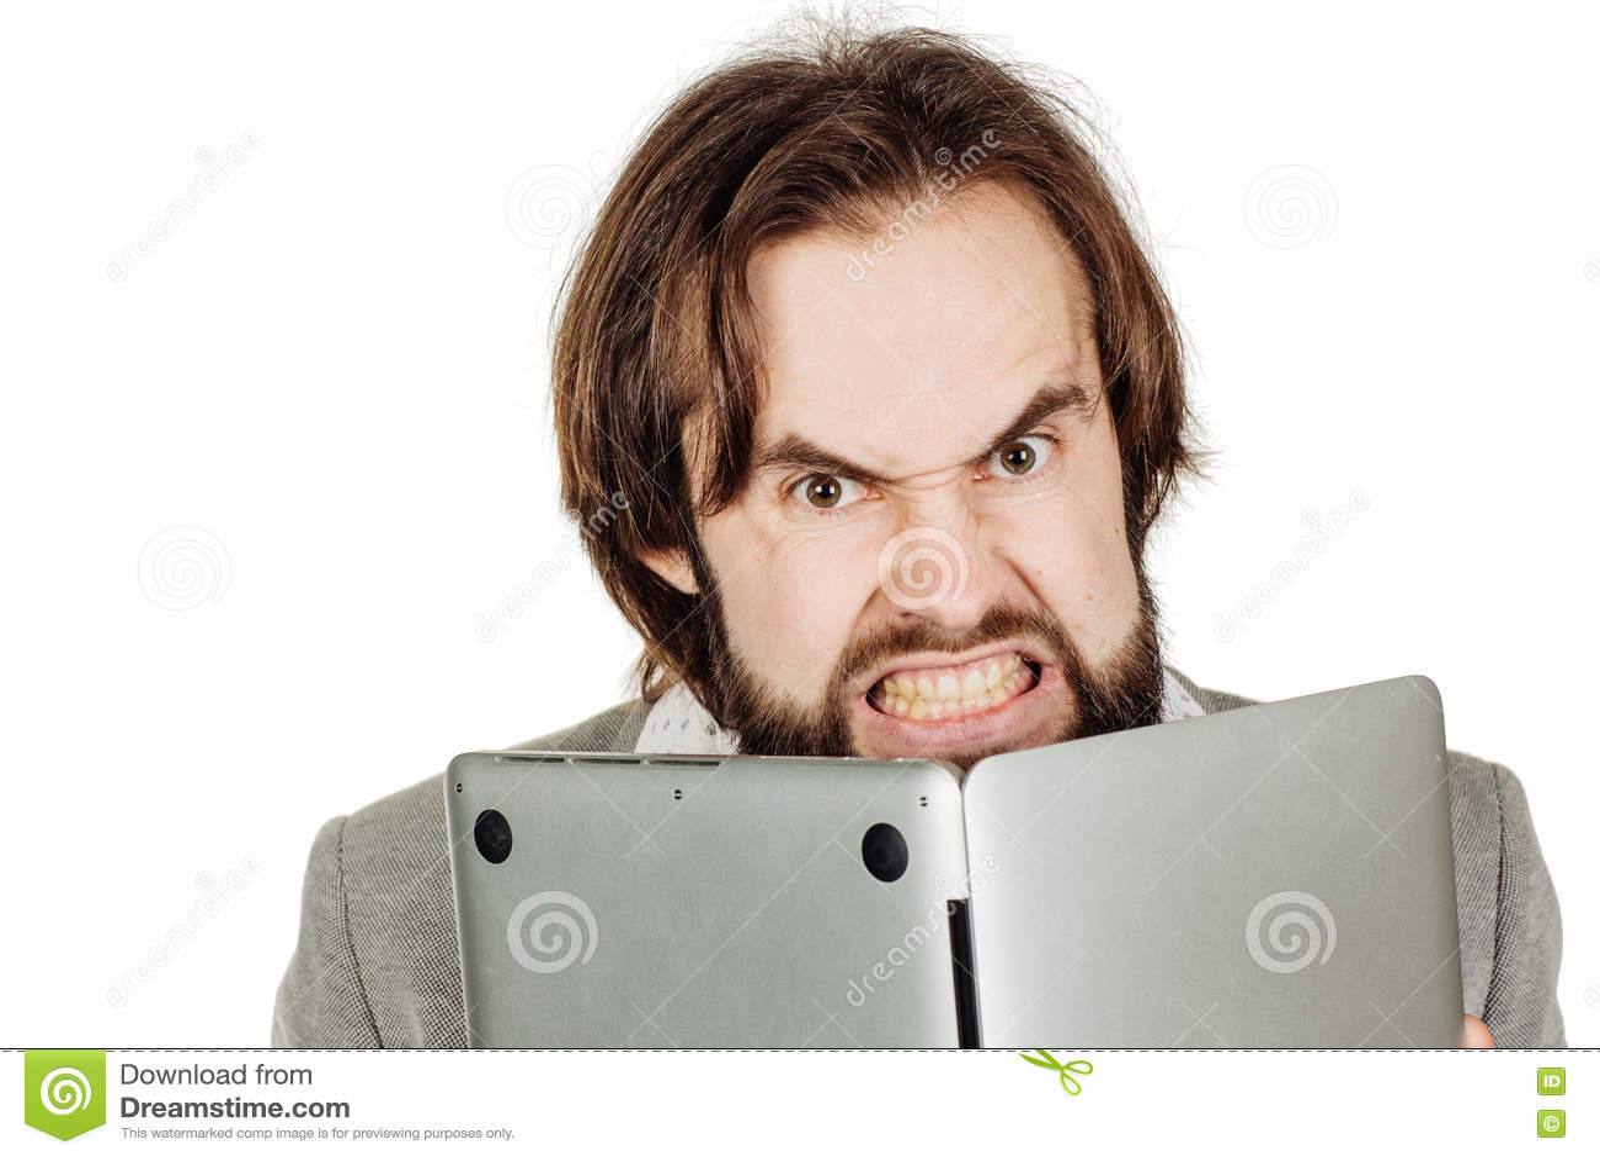 hiding behind a computer screen